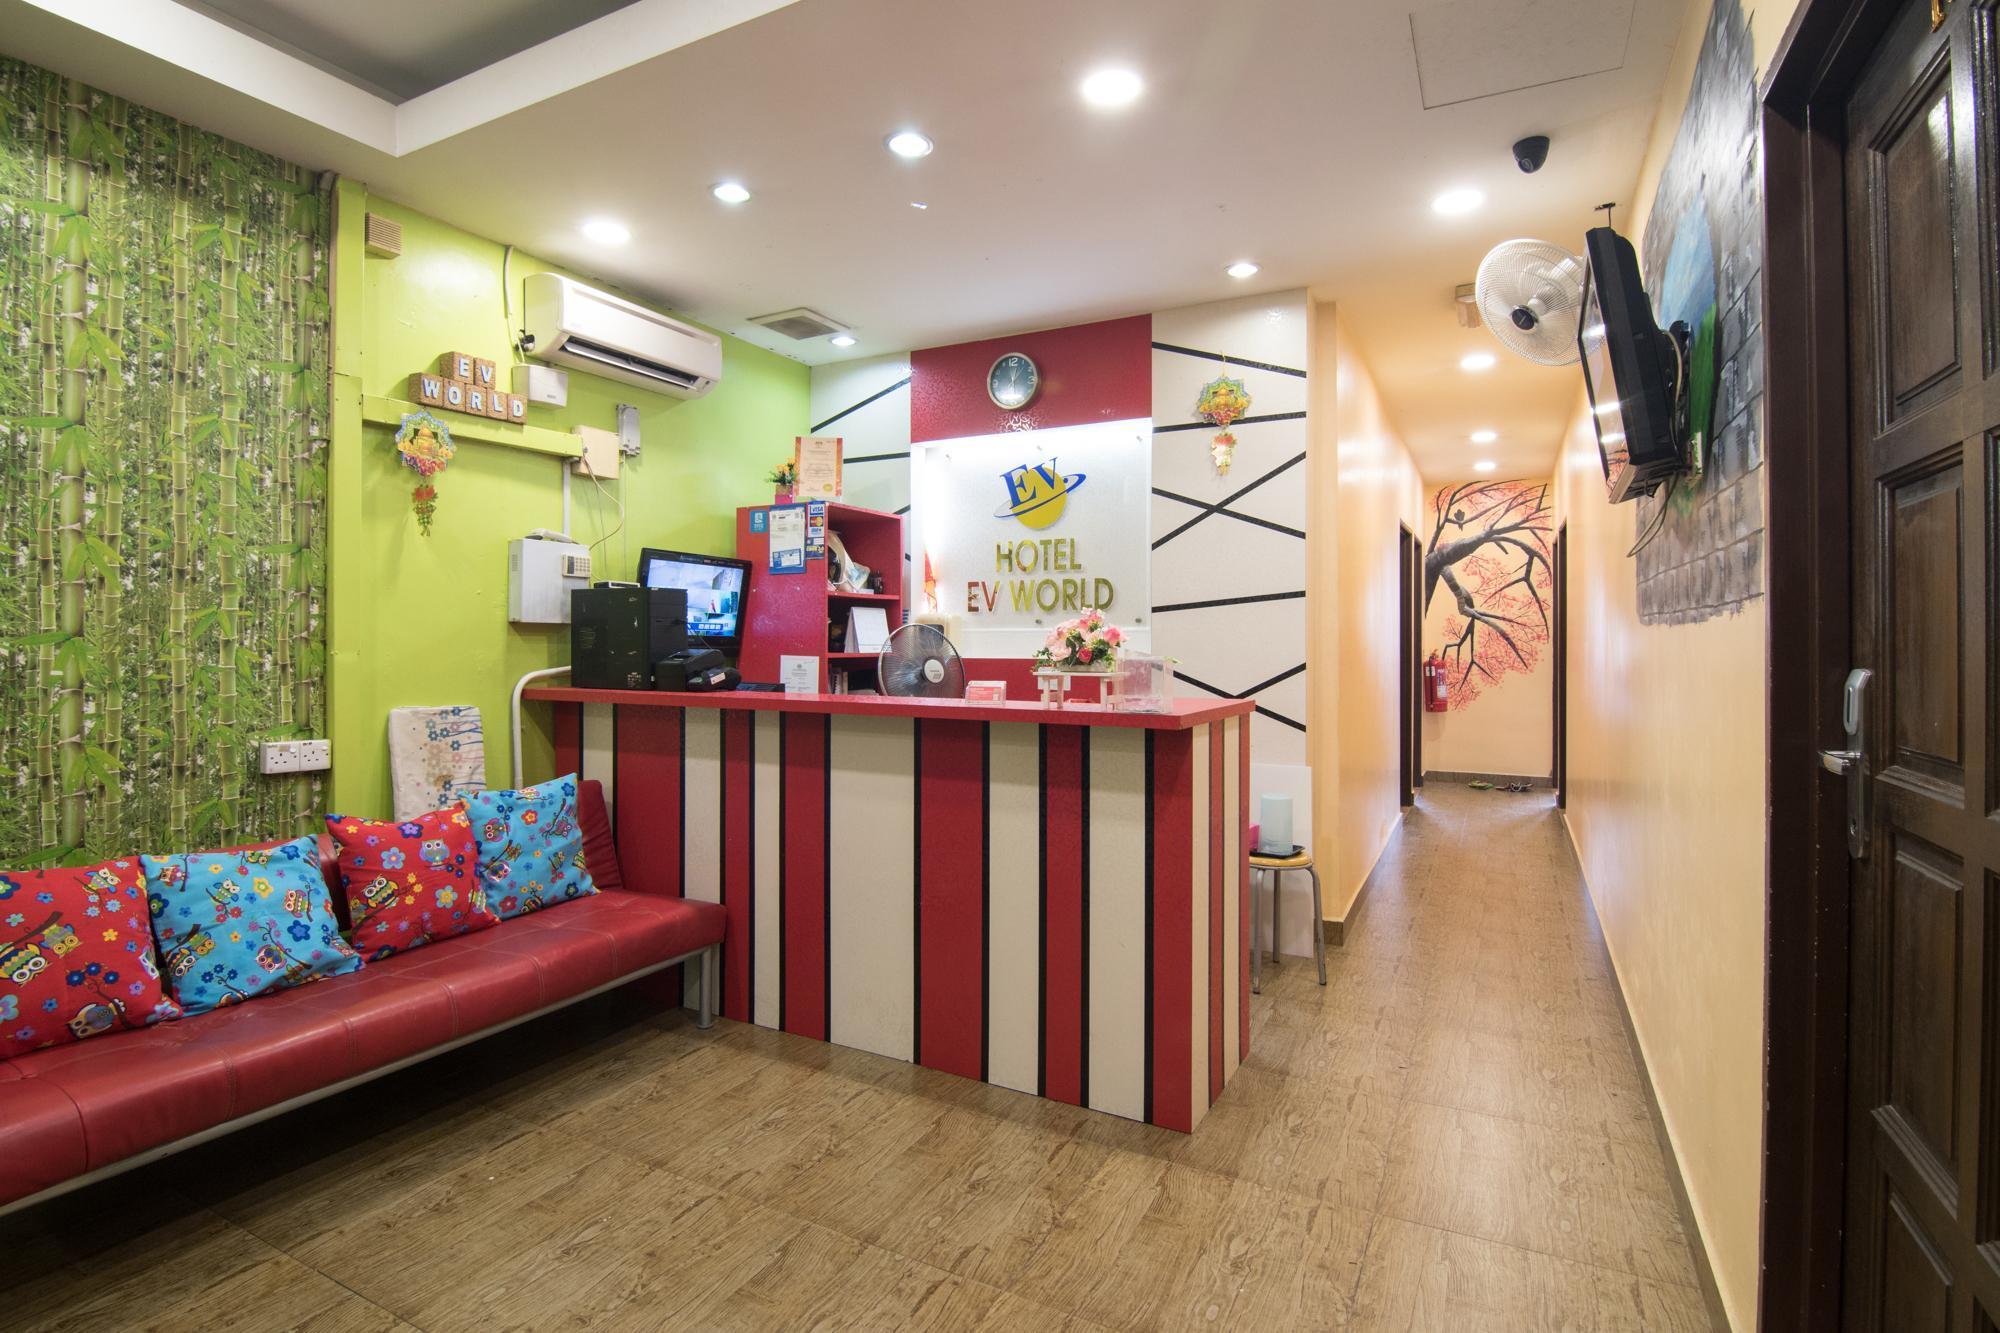 Ev World Hotel Shah Alam Uitm Hospital Shah Alam In Malaysia